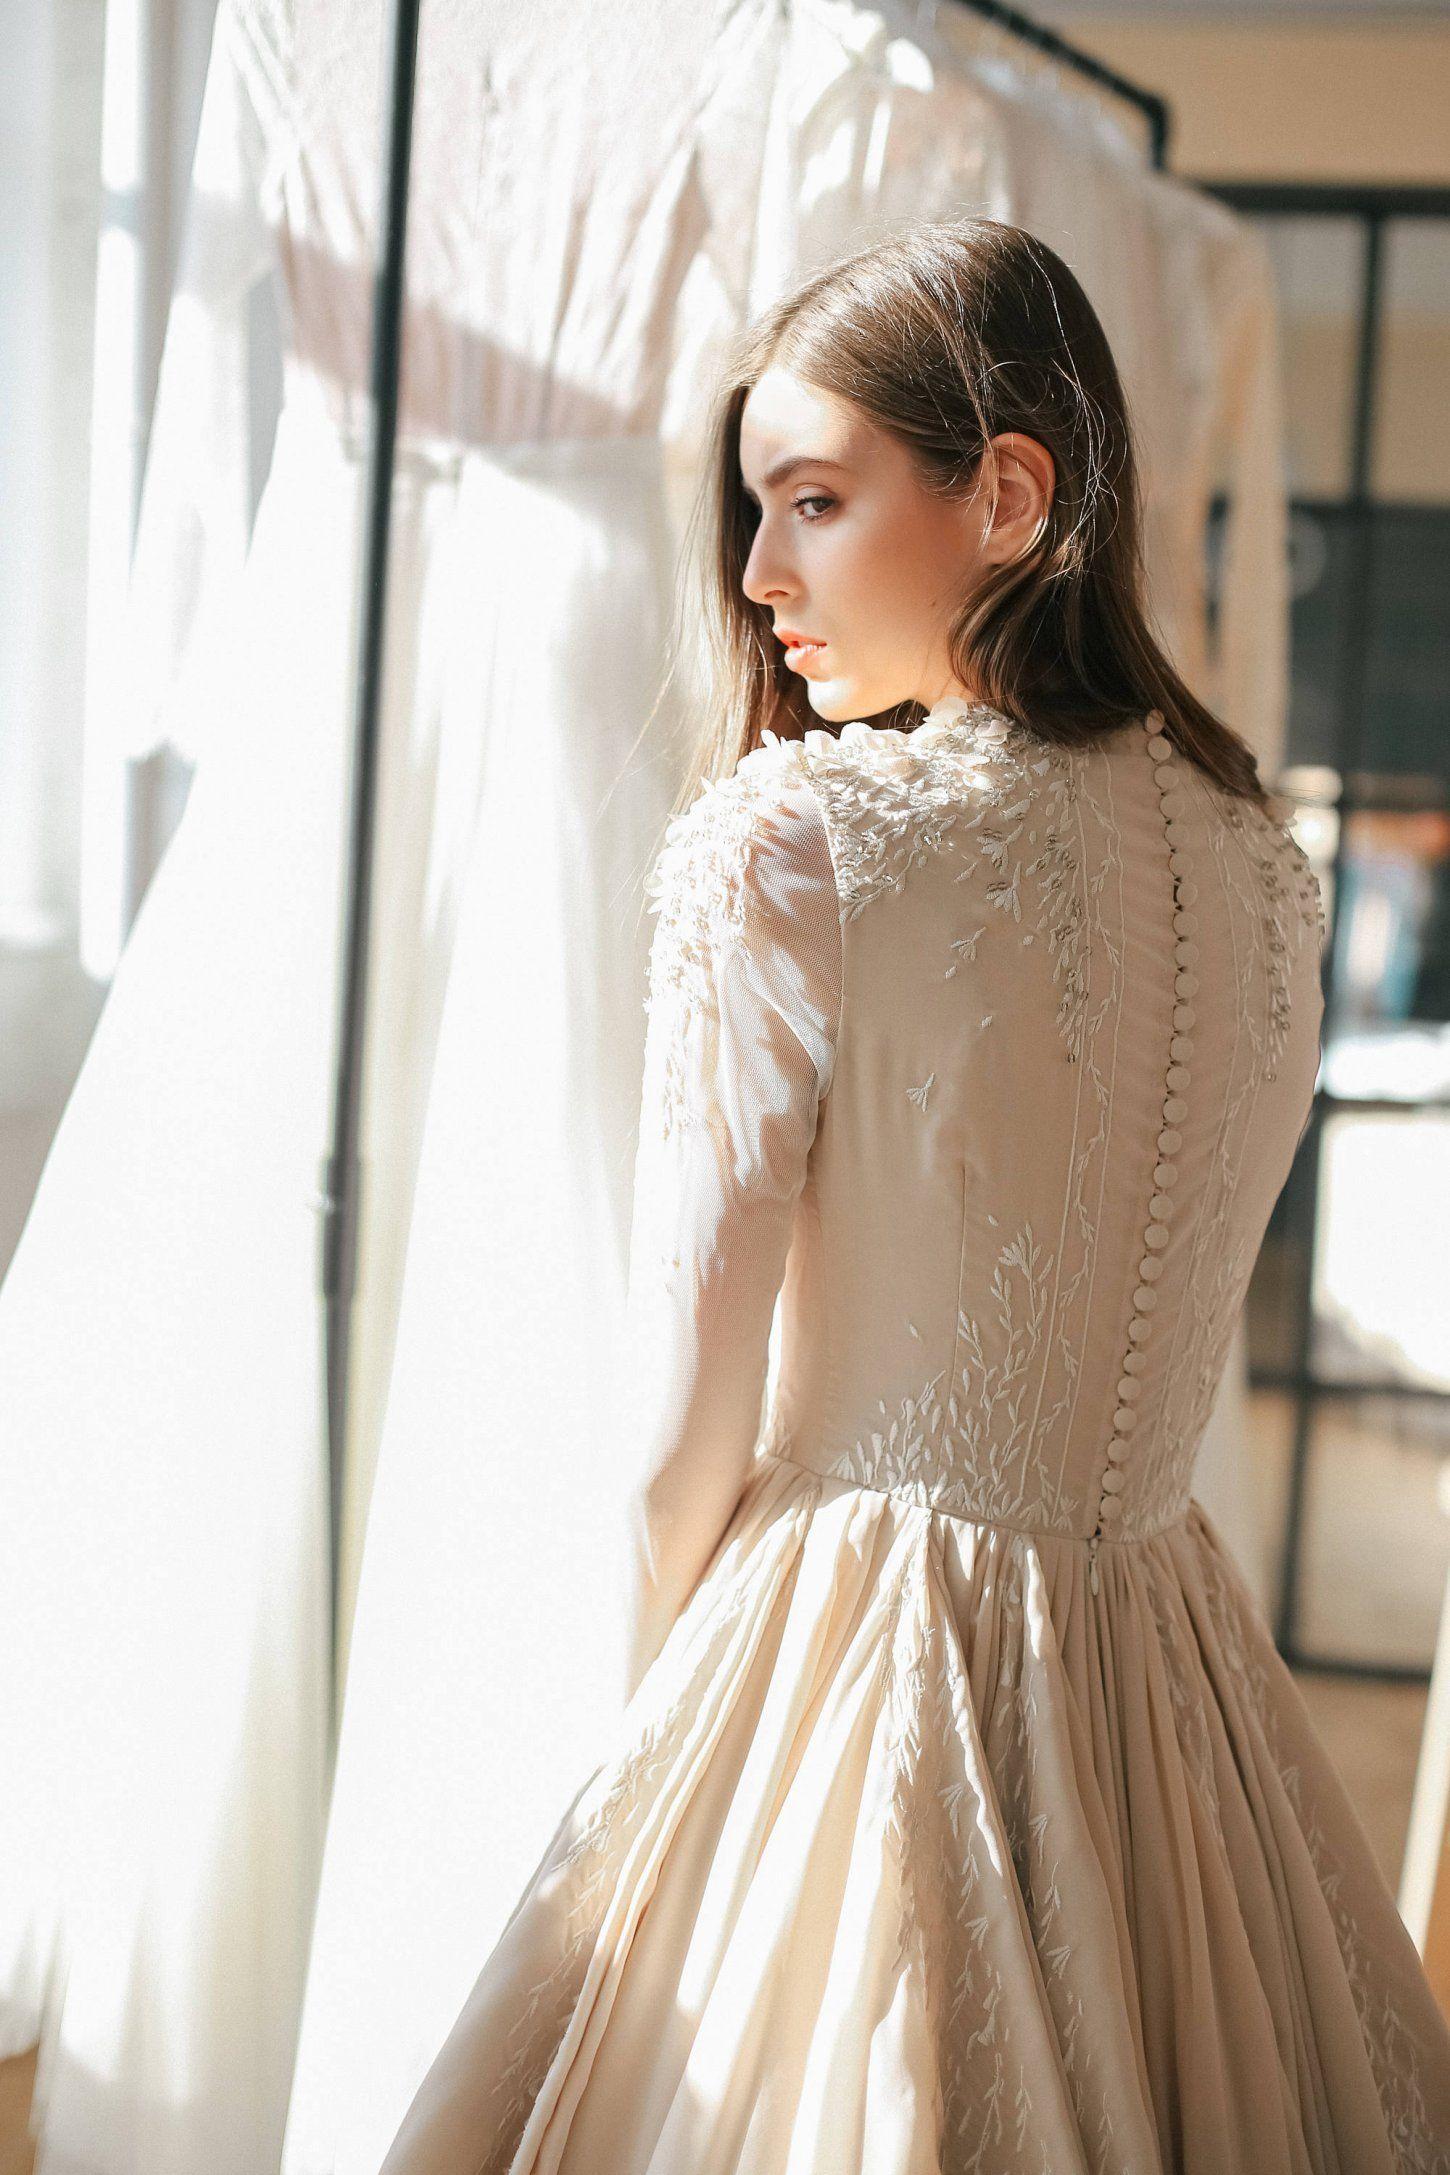 Ballgown beige wedding dress with sheer long sleeve